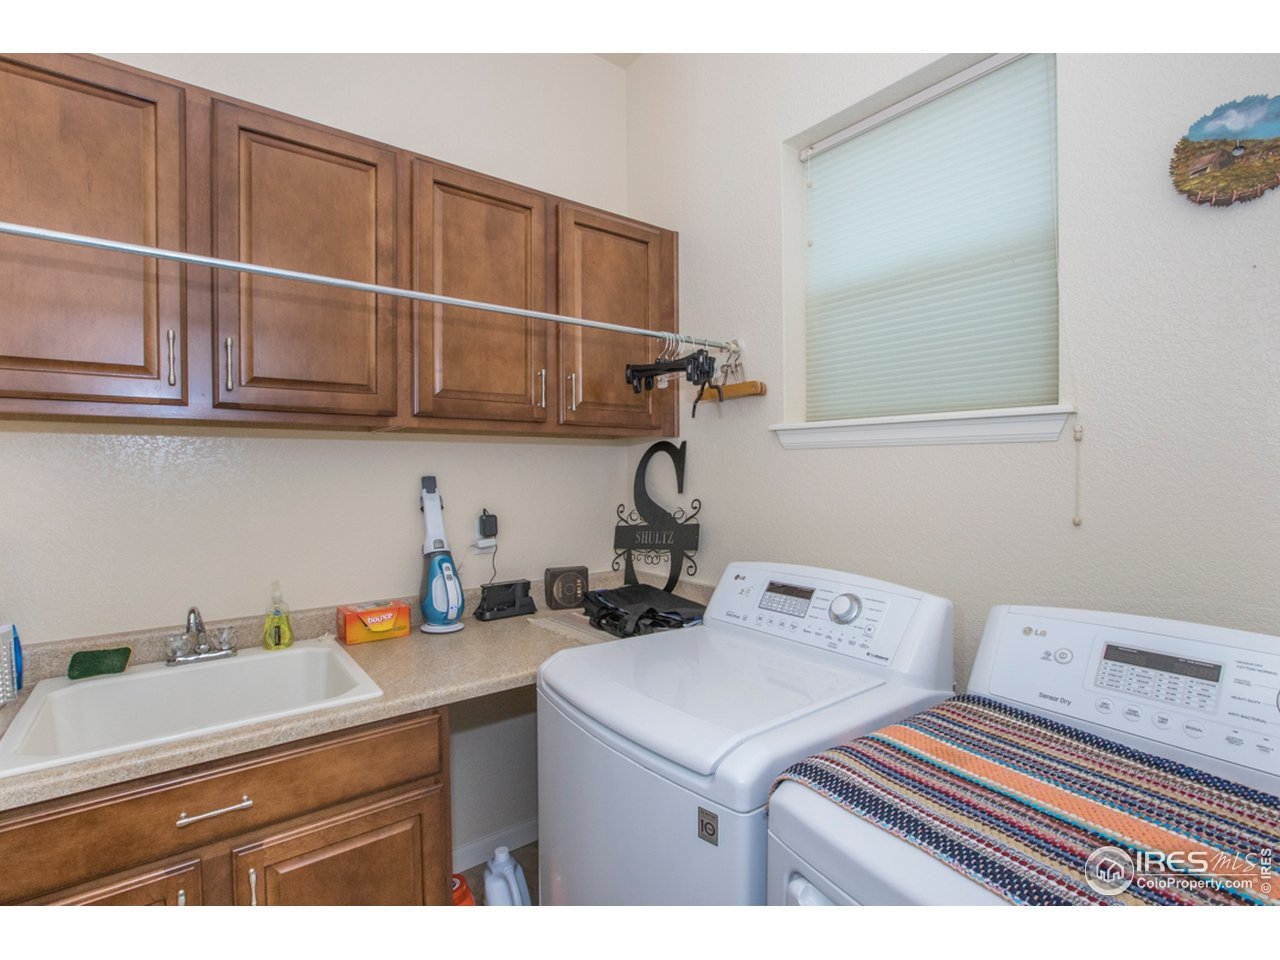 Sink, folding space & extra storage